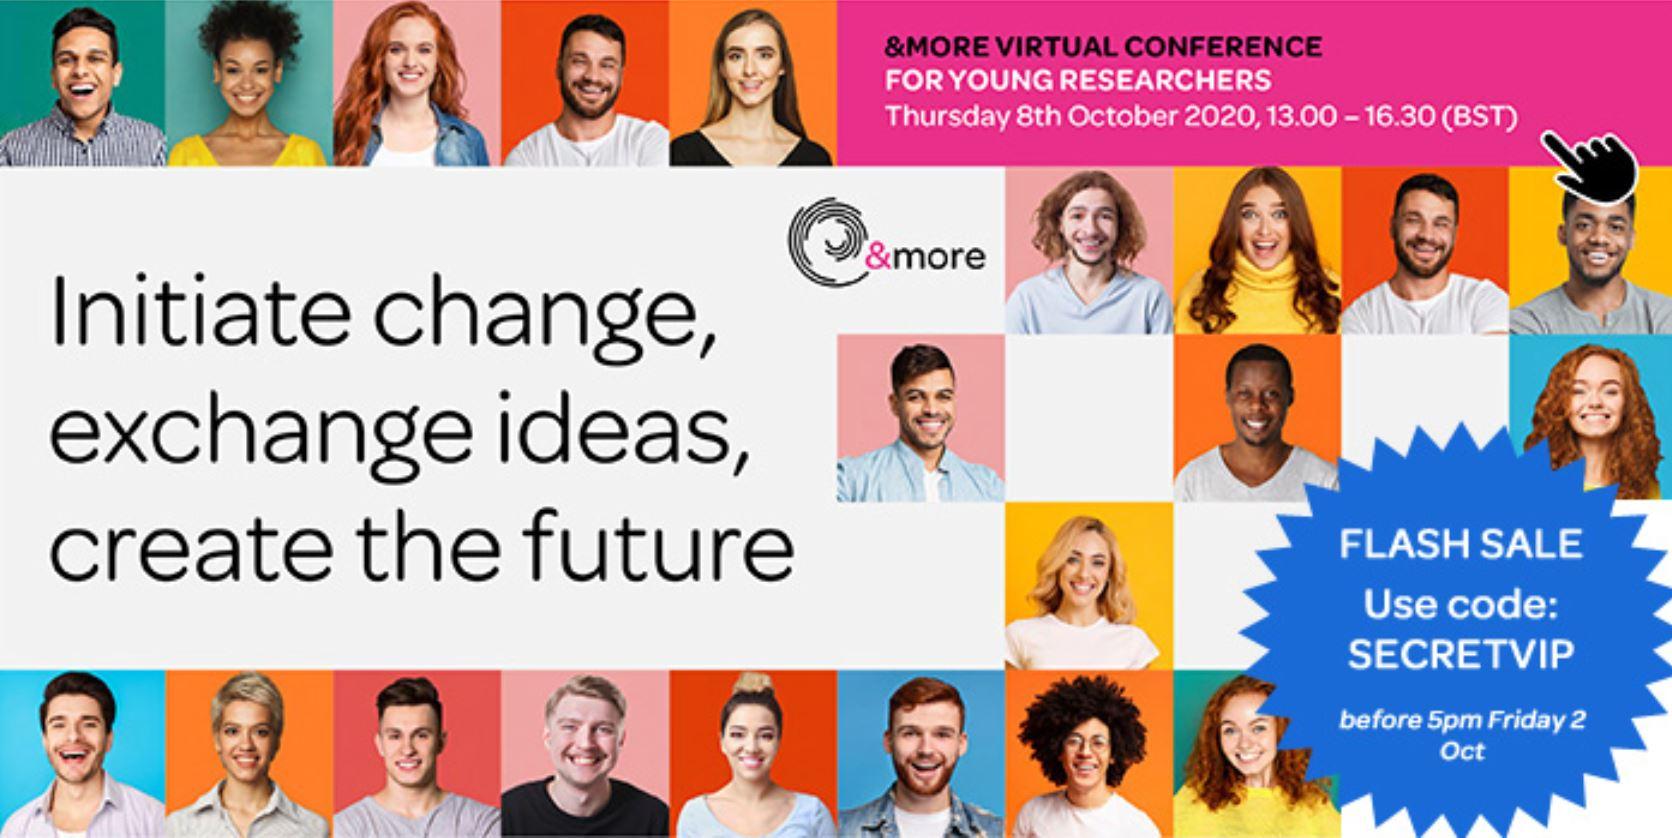 &more Virtual Conference